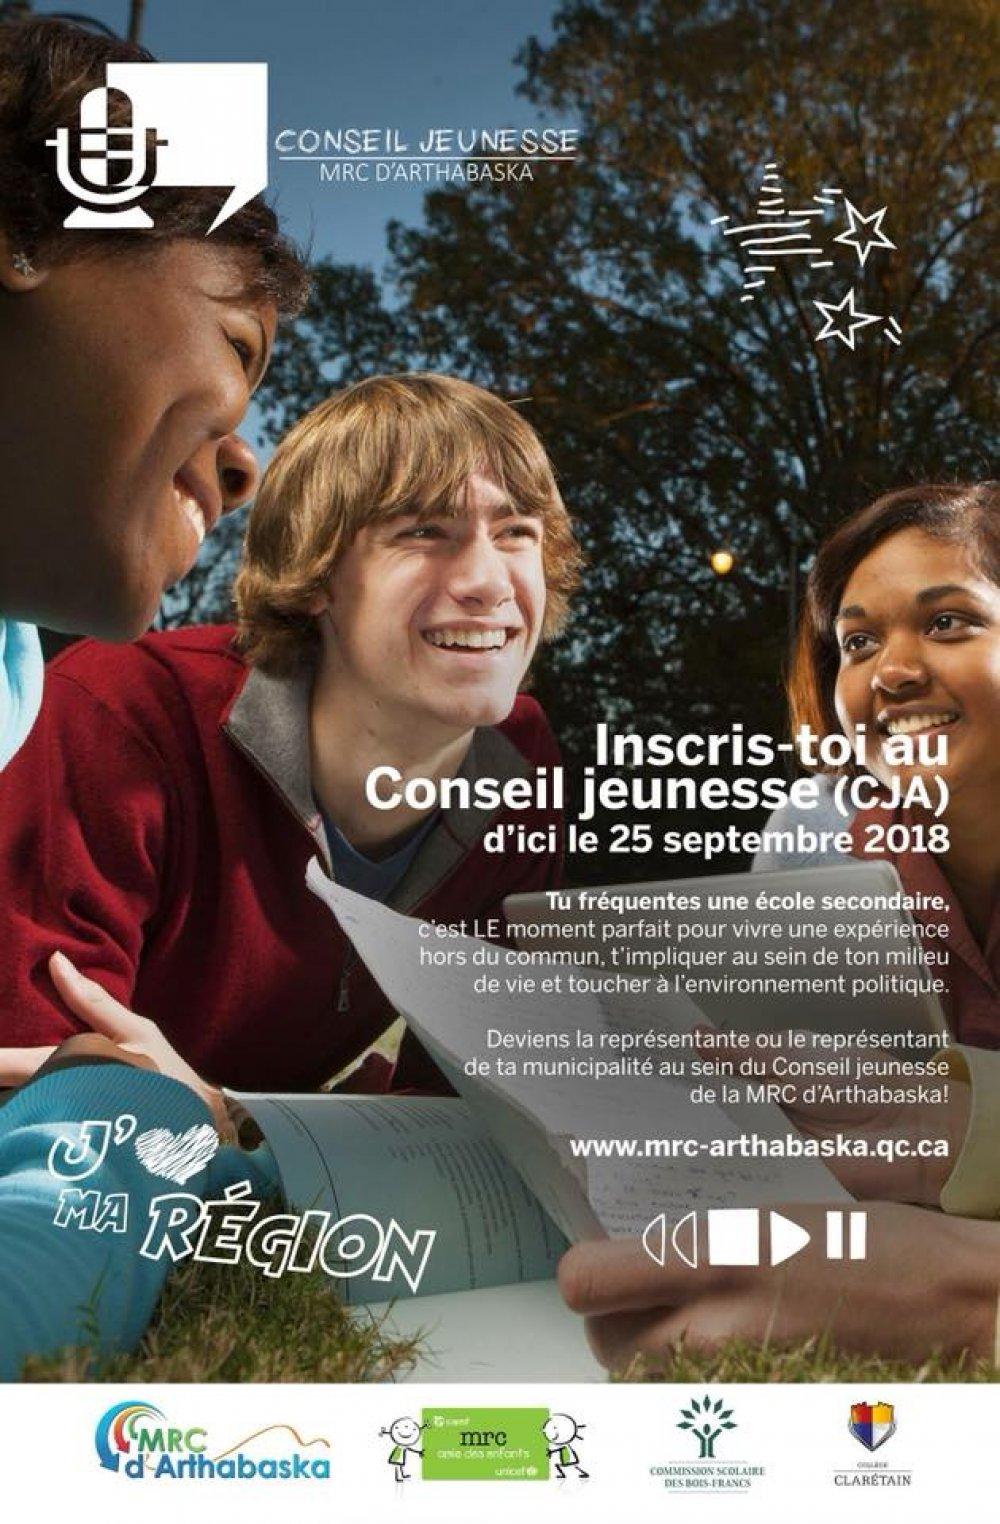 Conseil jeunesse (CJA)